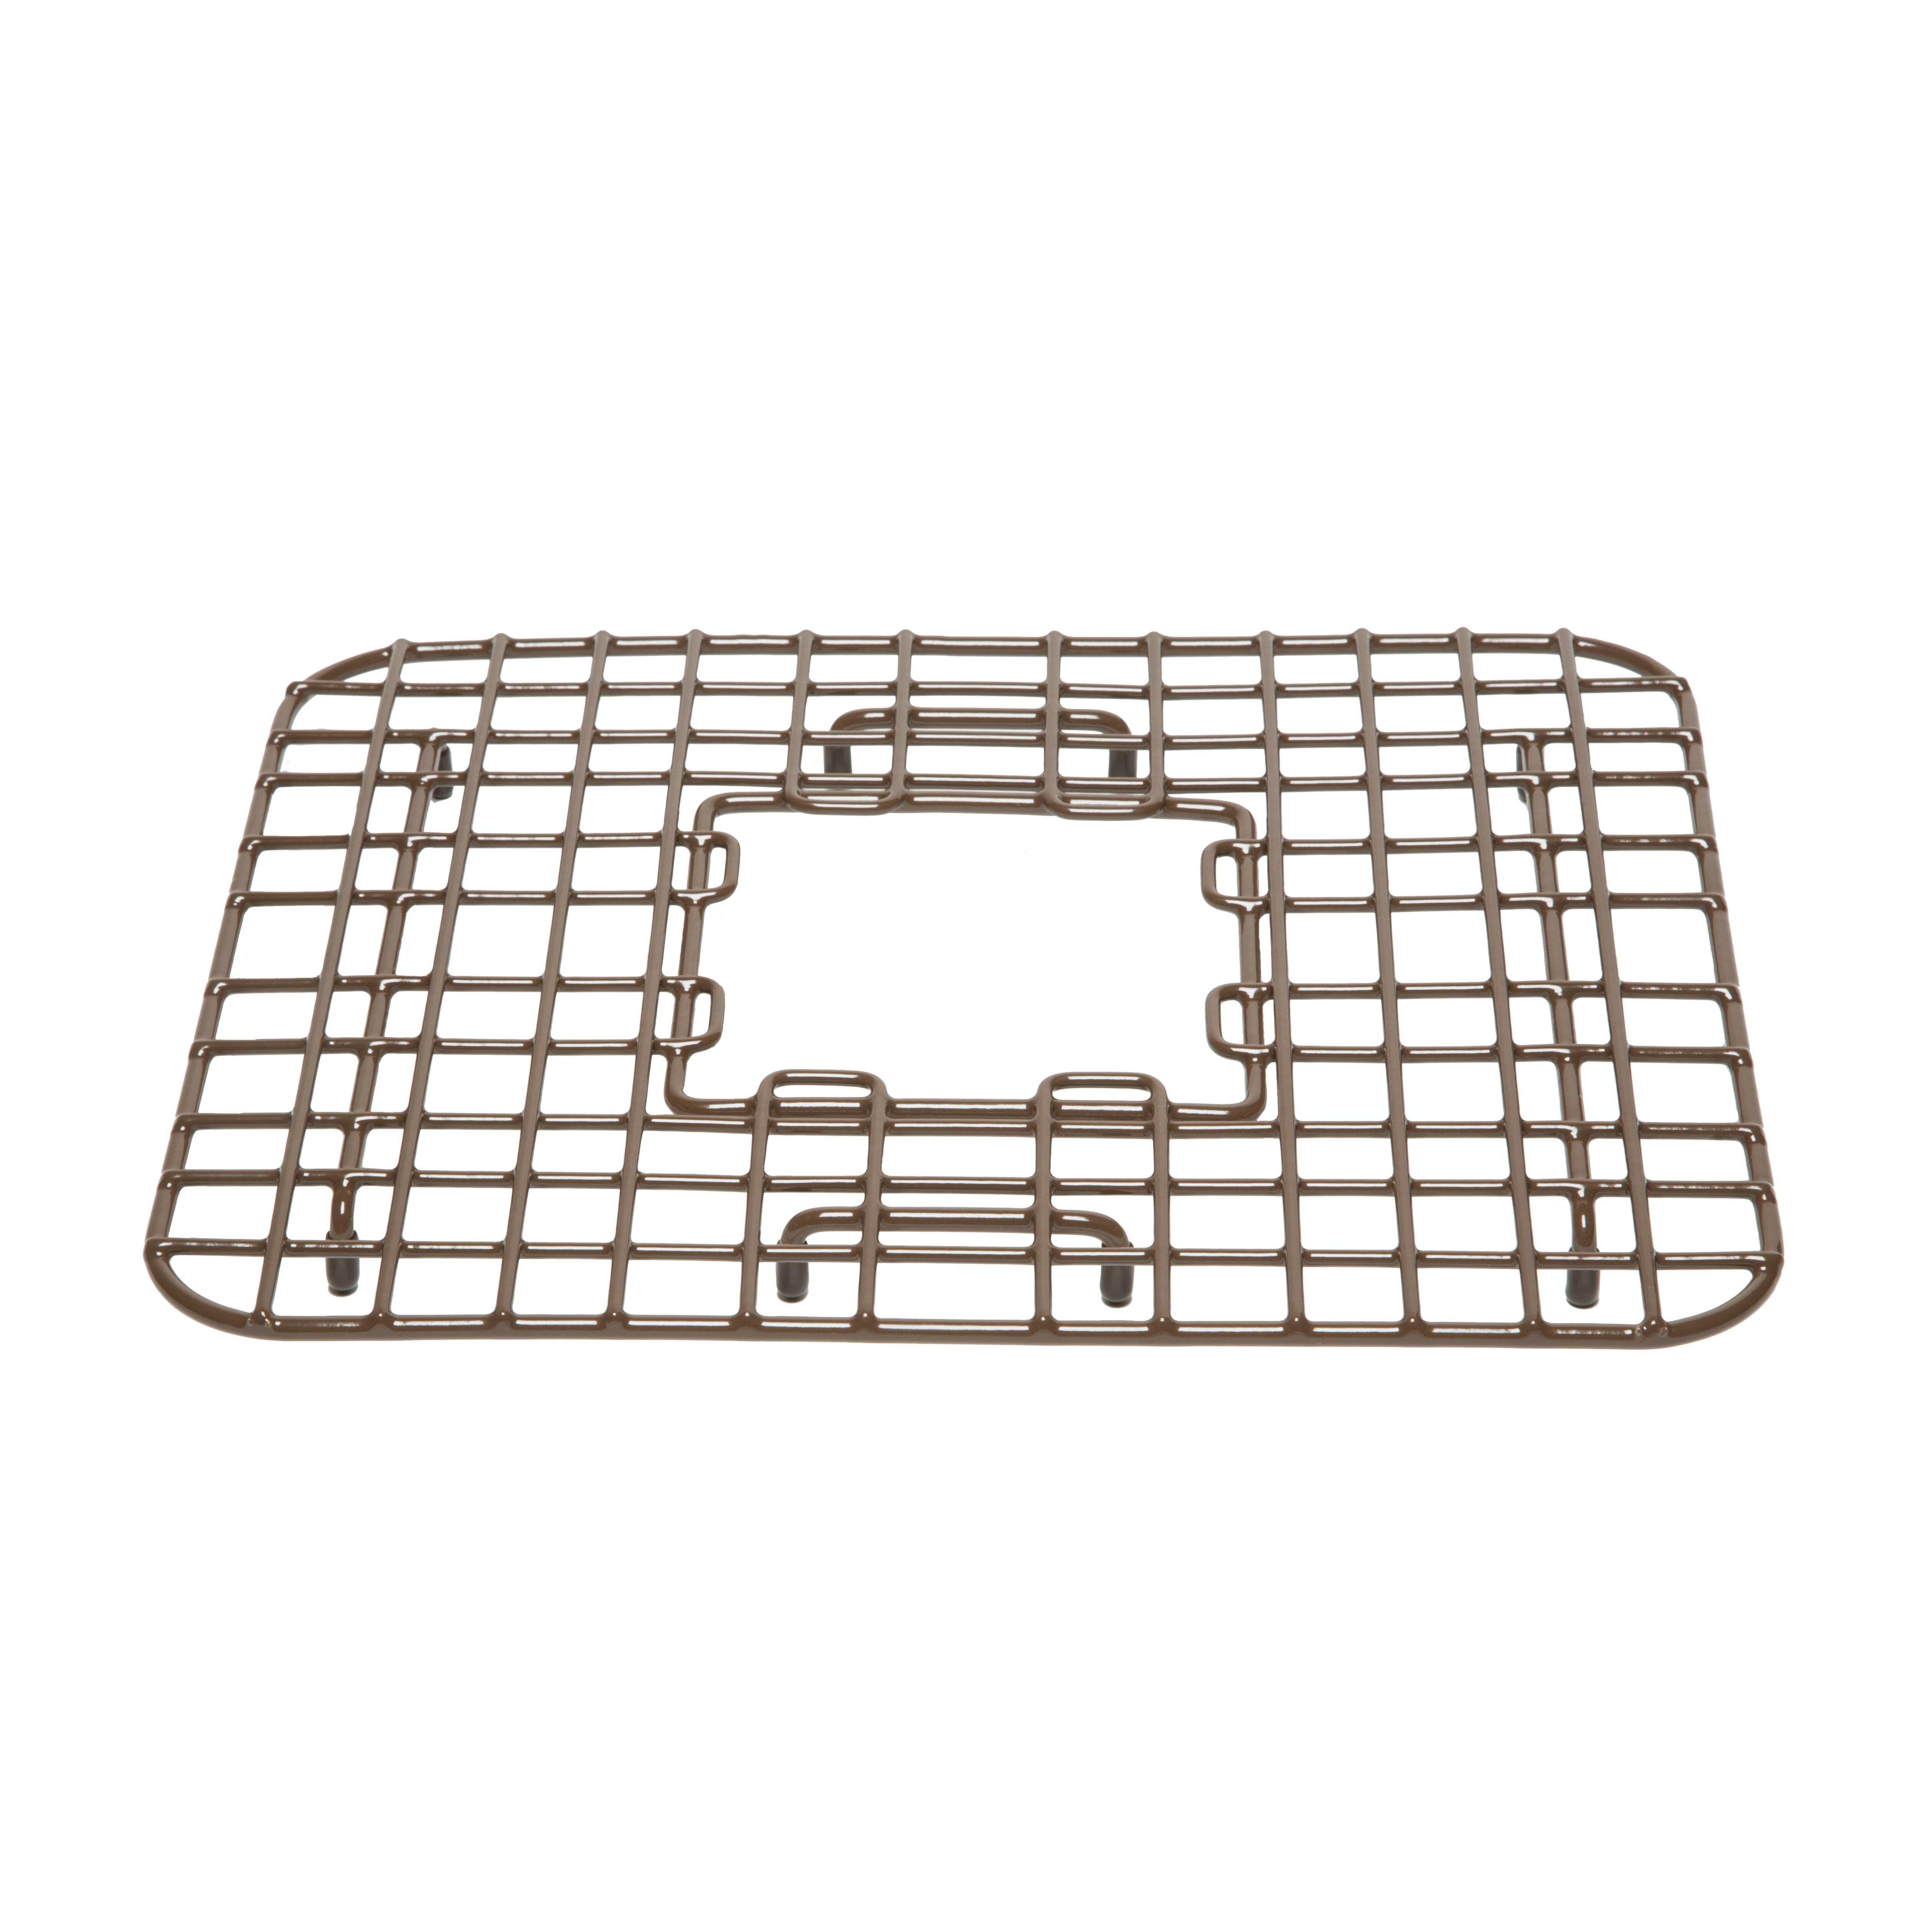 Gehry Copper Kitchen Sink Grid